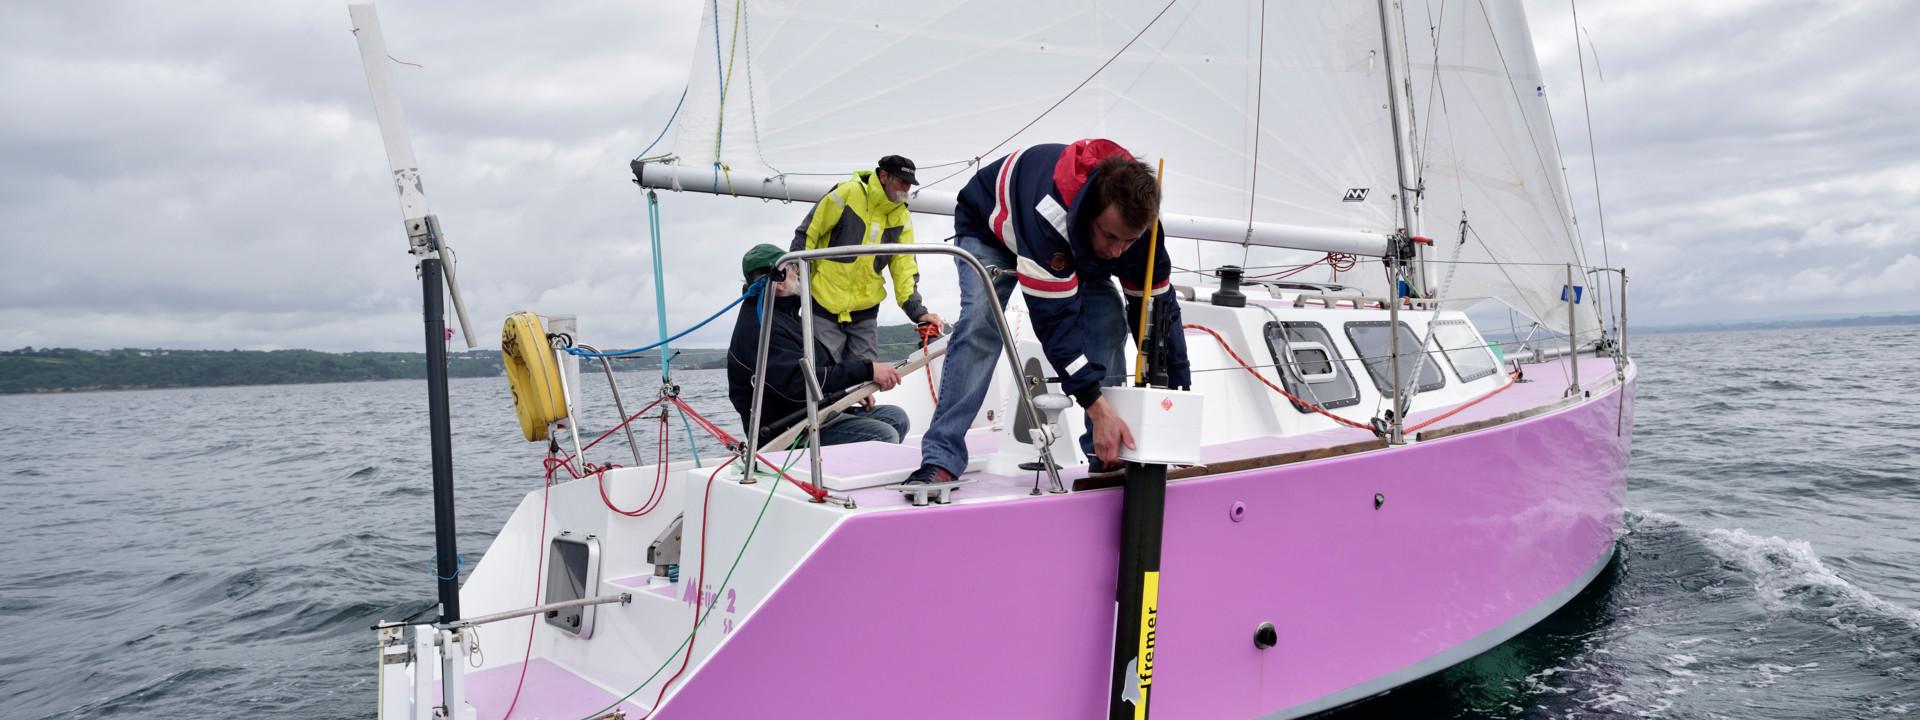 MeijeII sailing boat - May 2015